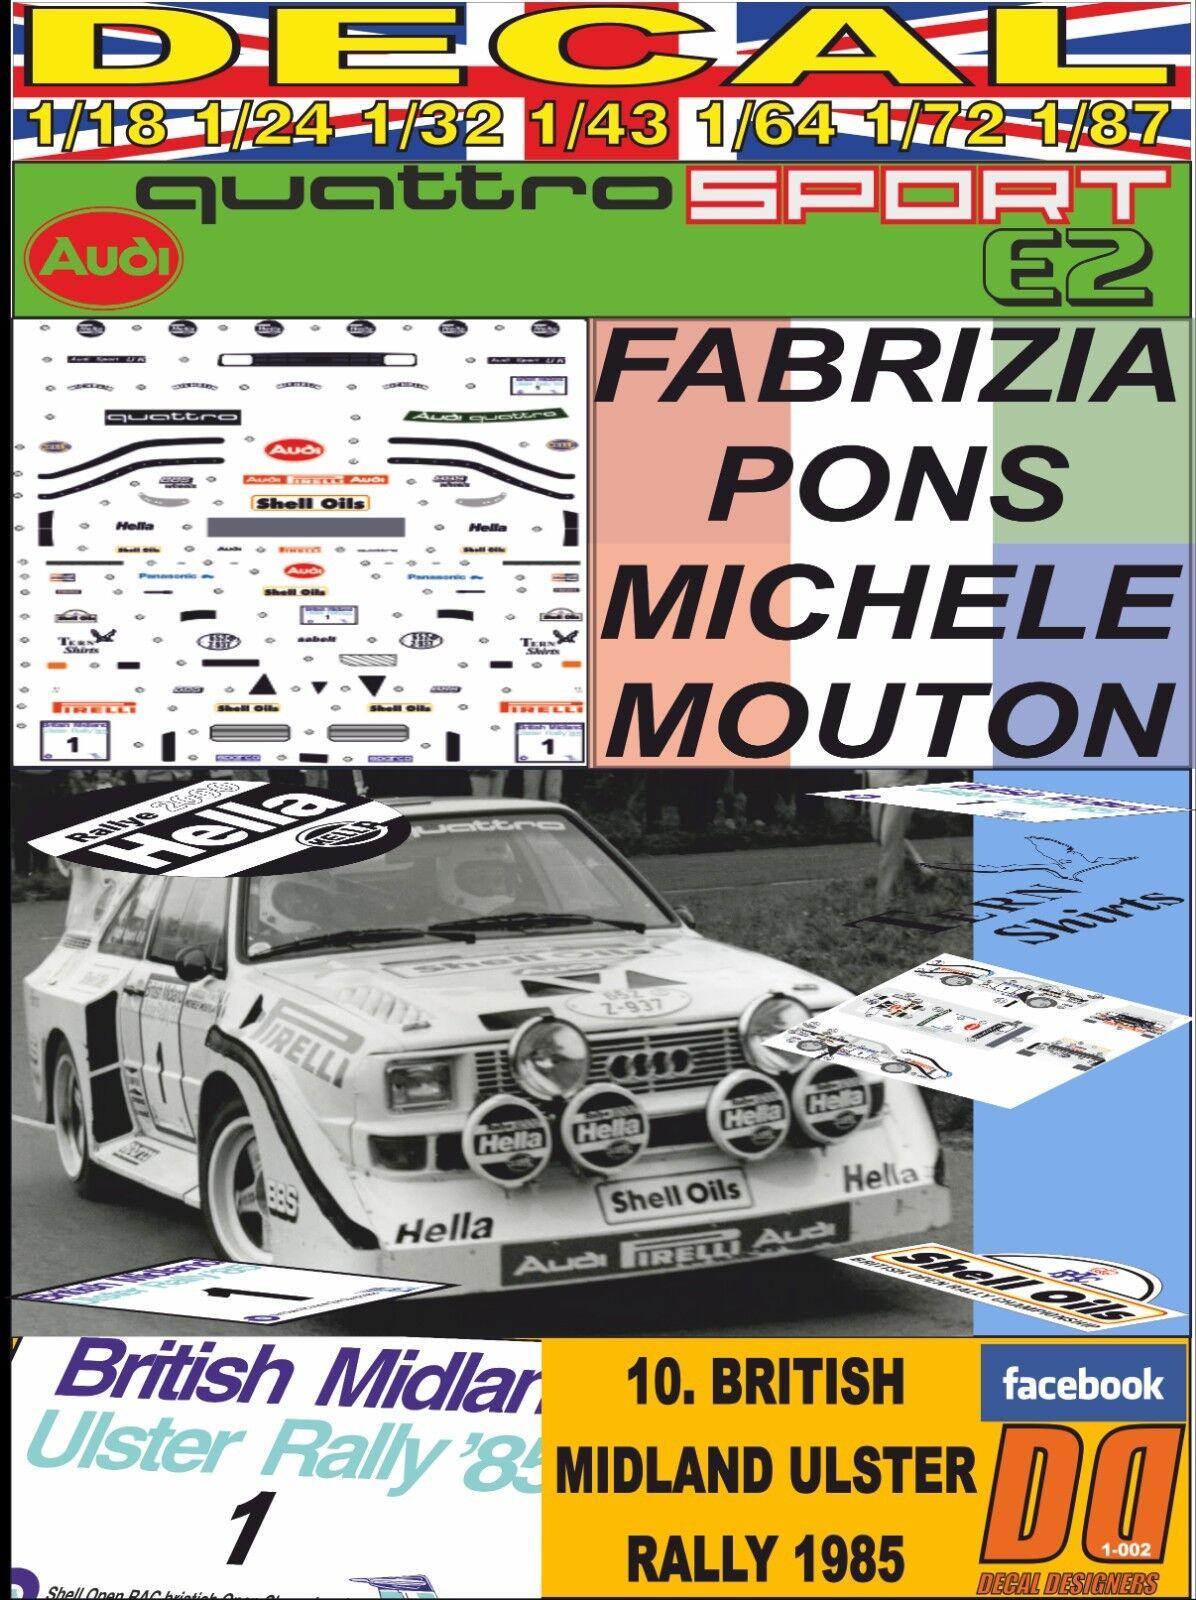 DECAL AUDI QUATTRO SPORT E2 MICHELLE MOUTON RALLY ULSTER 1985 DnF (03)